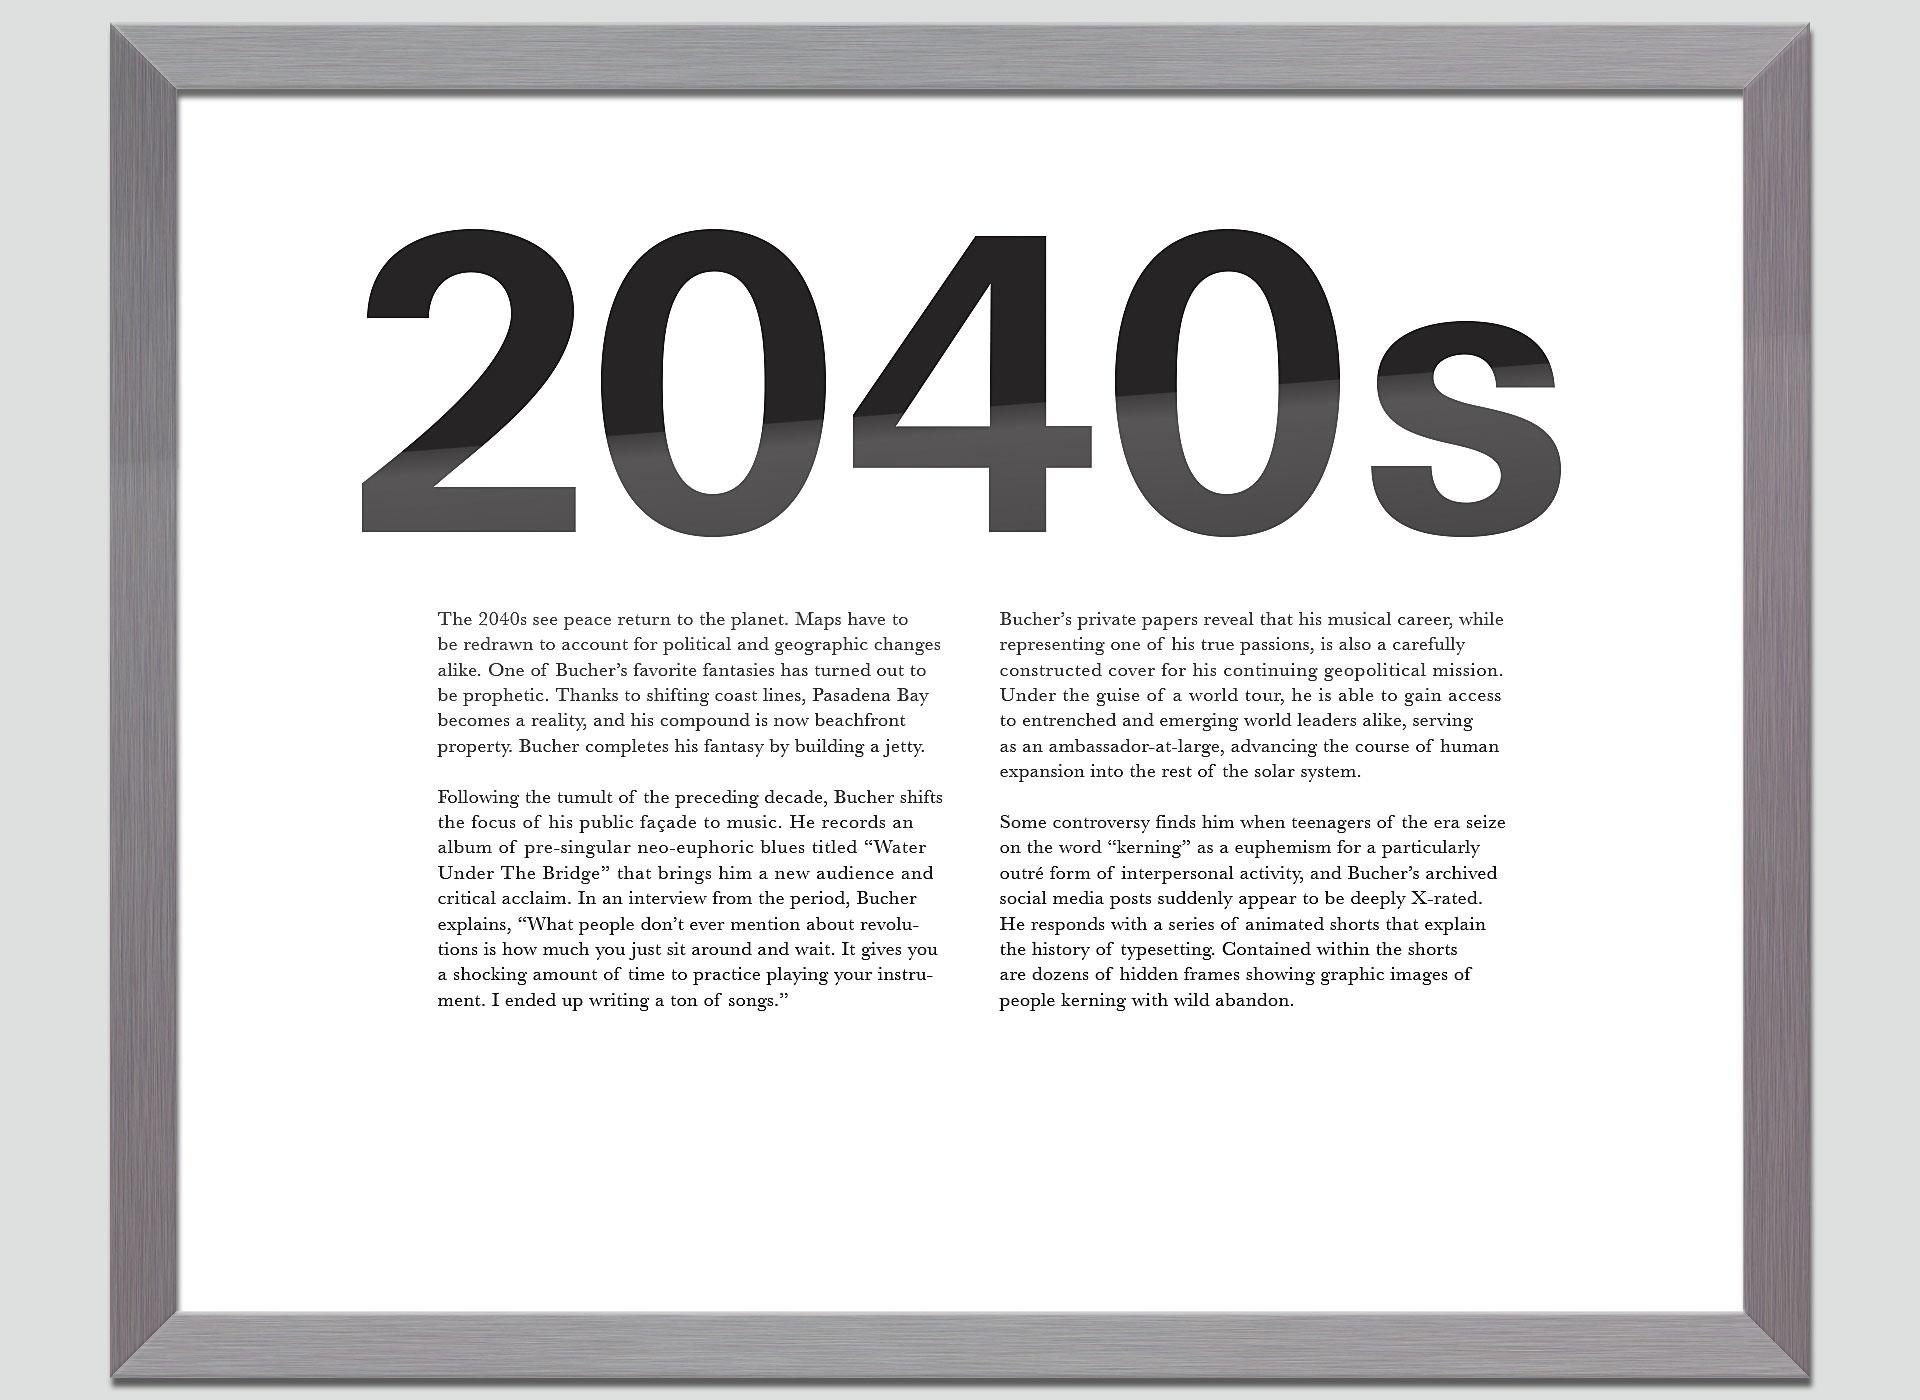 everything-decades-2040@2x.jpg